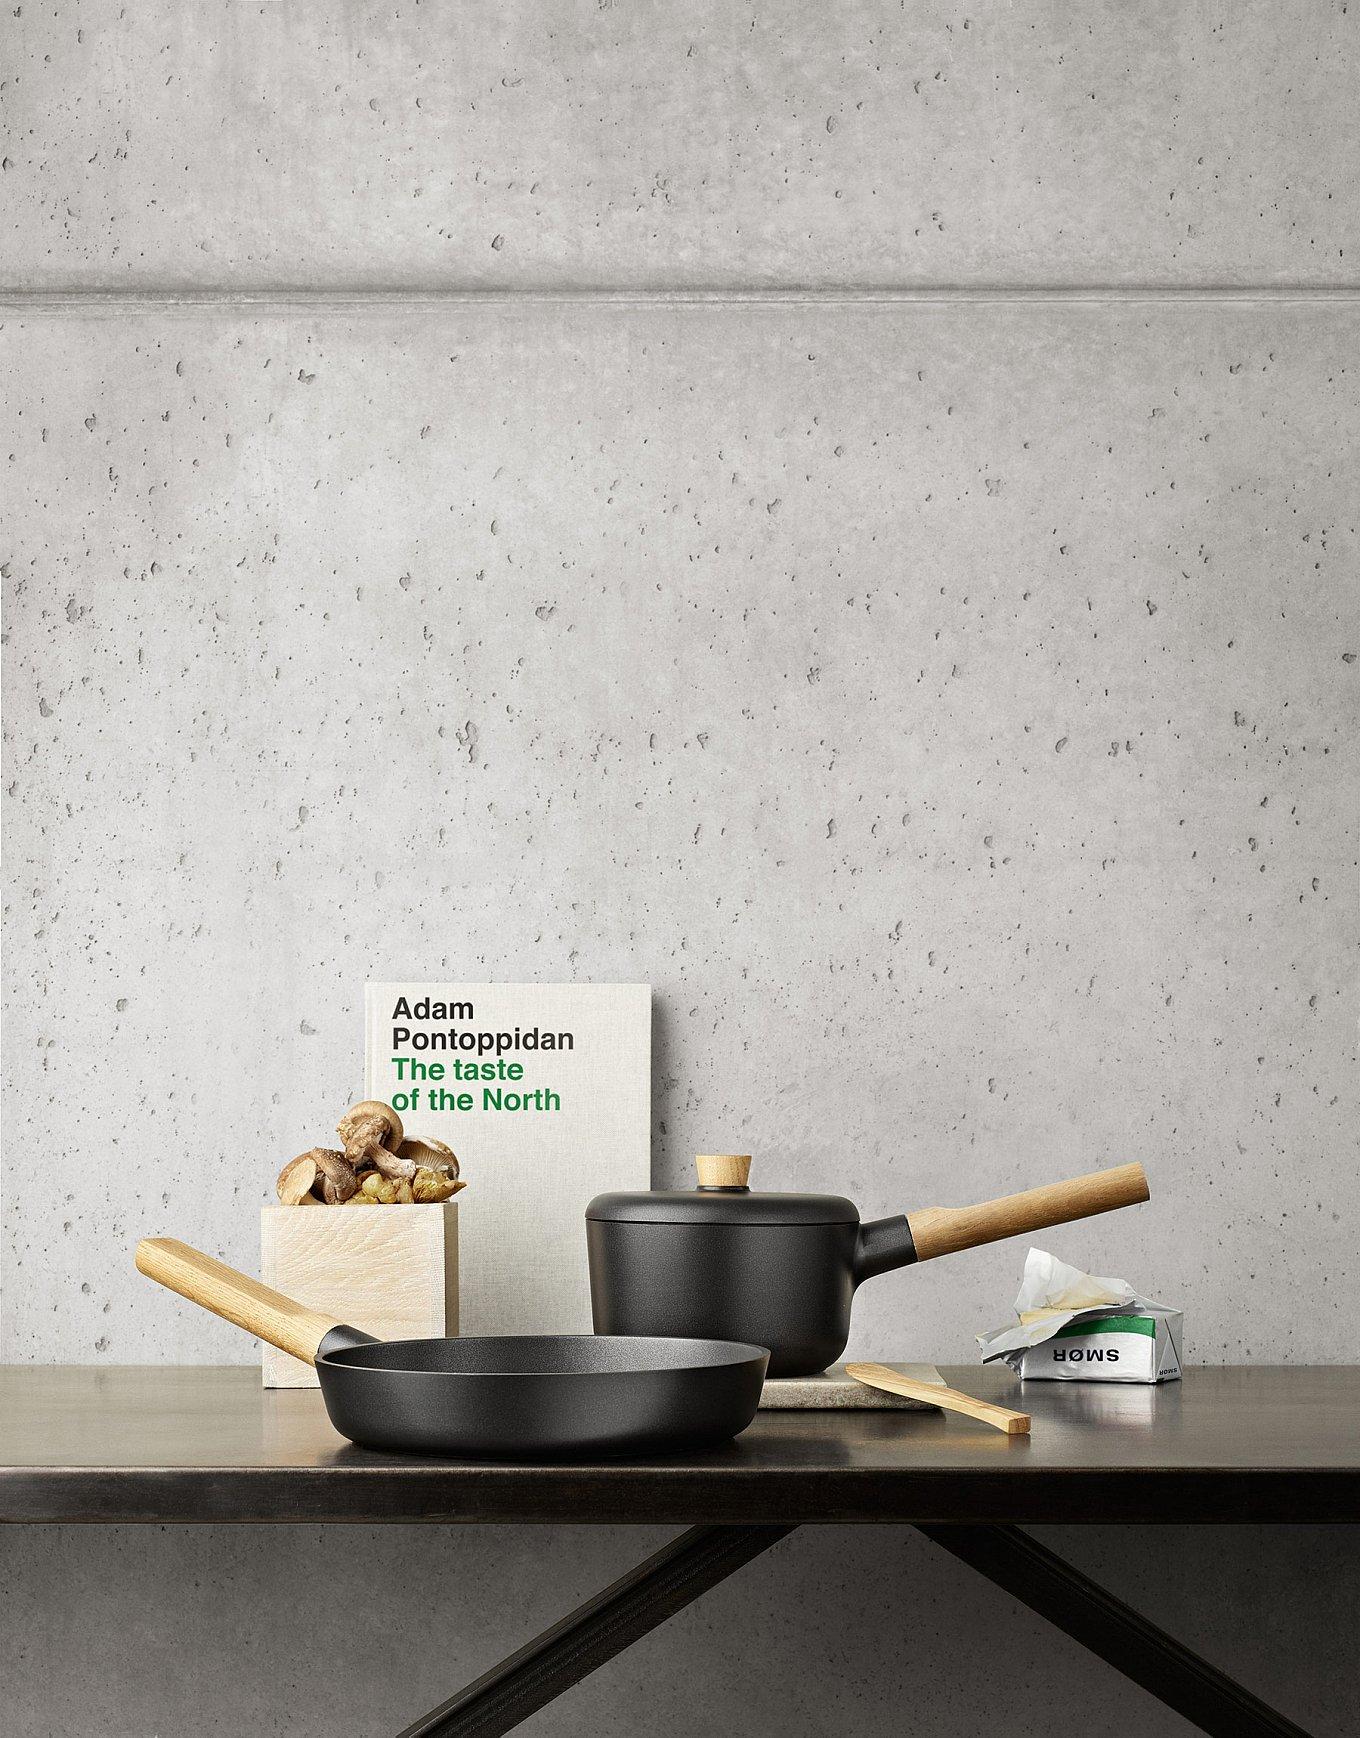 nordic-kitchen-minimalist-cookware-series-5